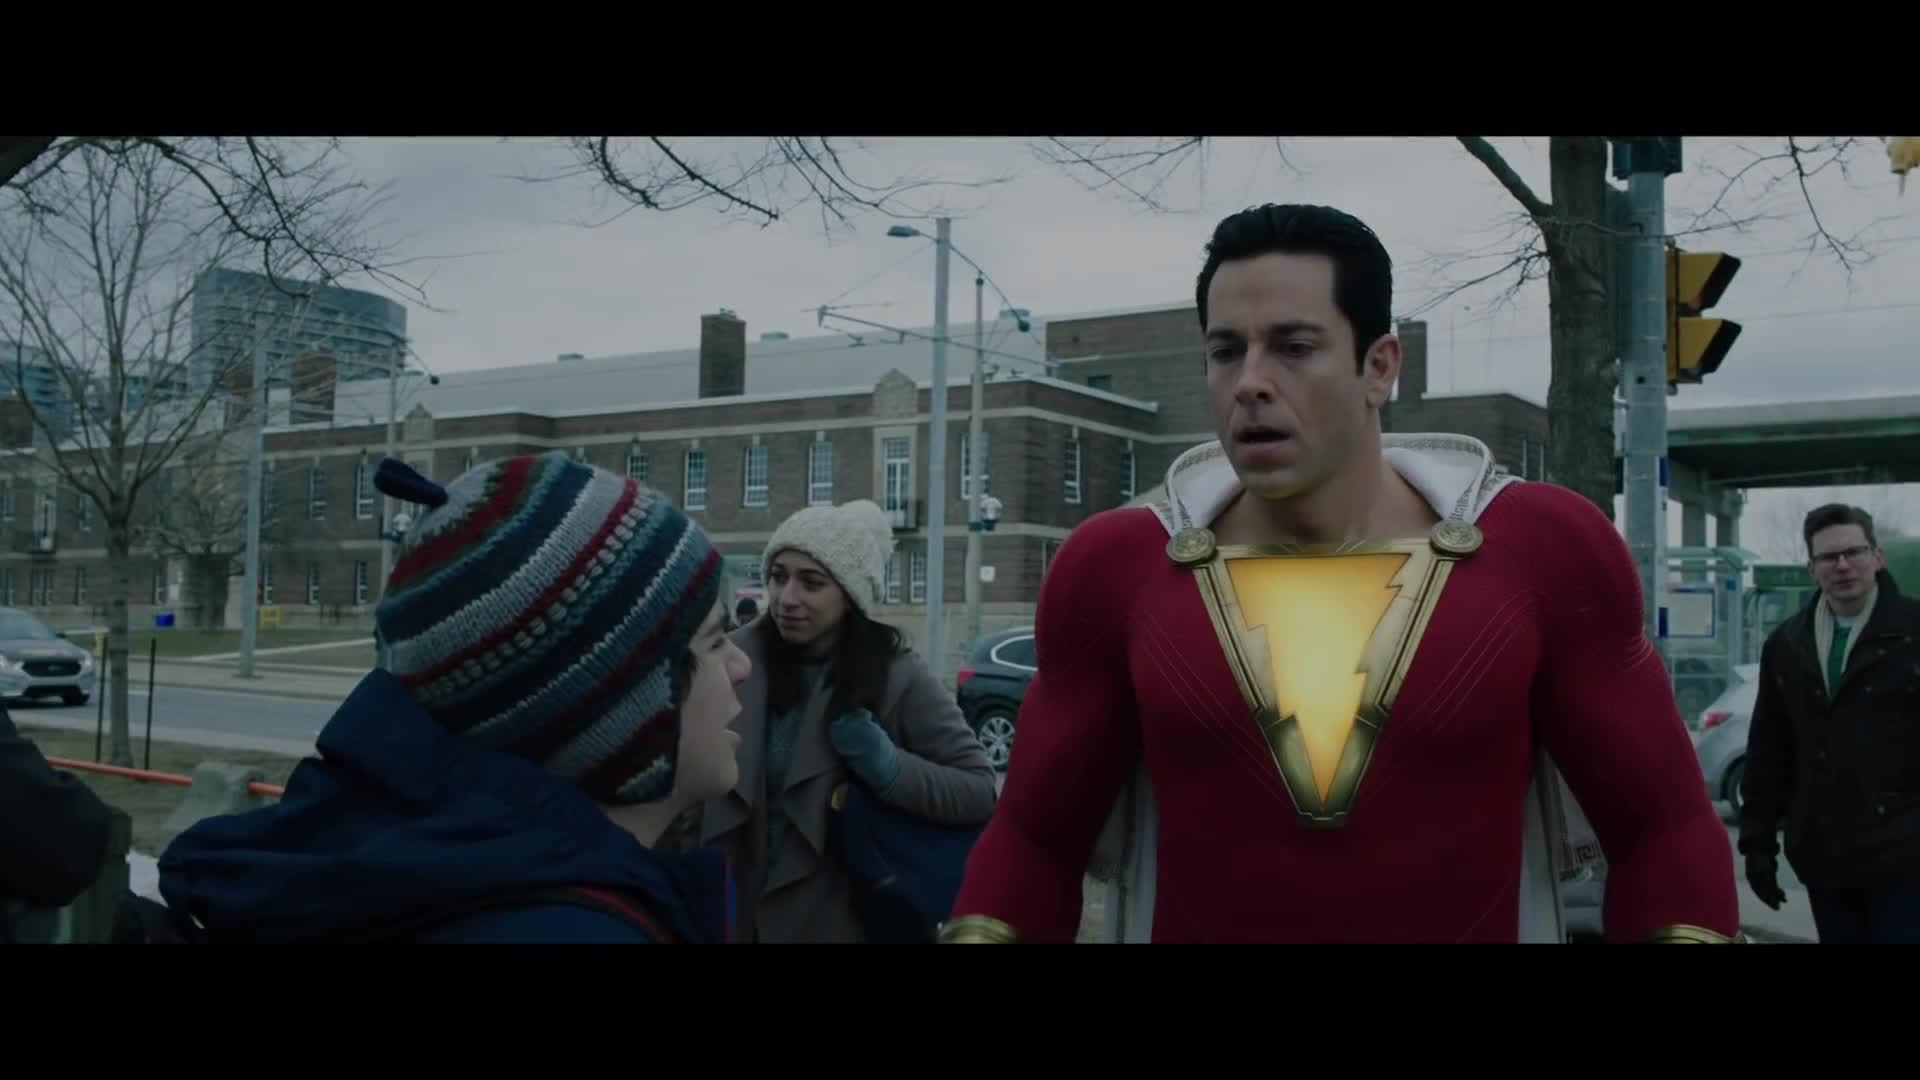 Trailer, Kino, Kinofilm, Warner Bros., DC Comics, DC, Shazam